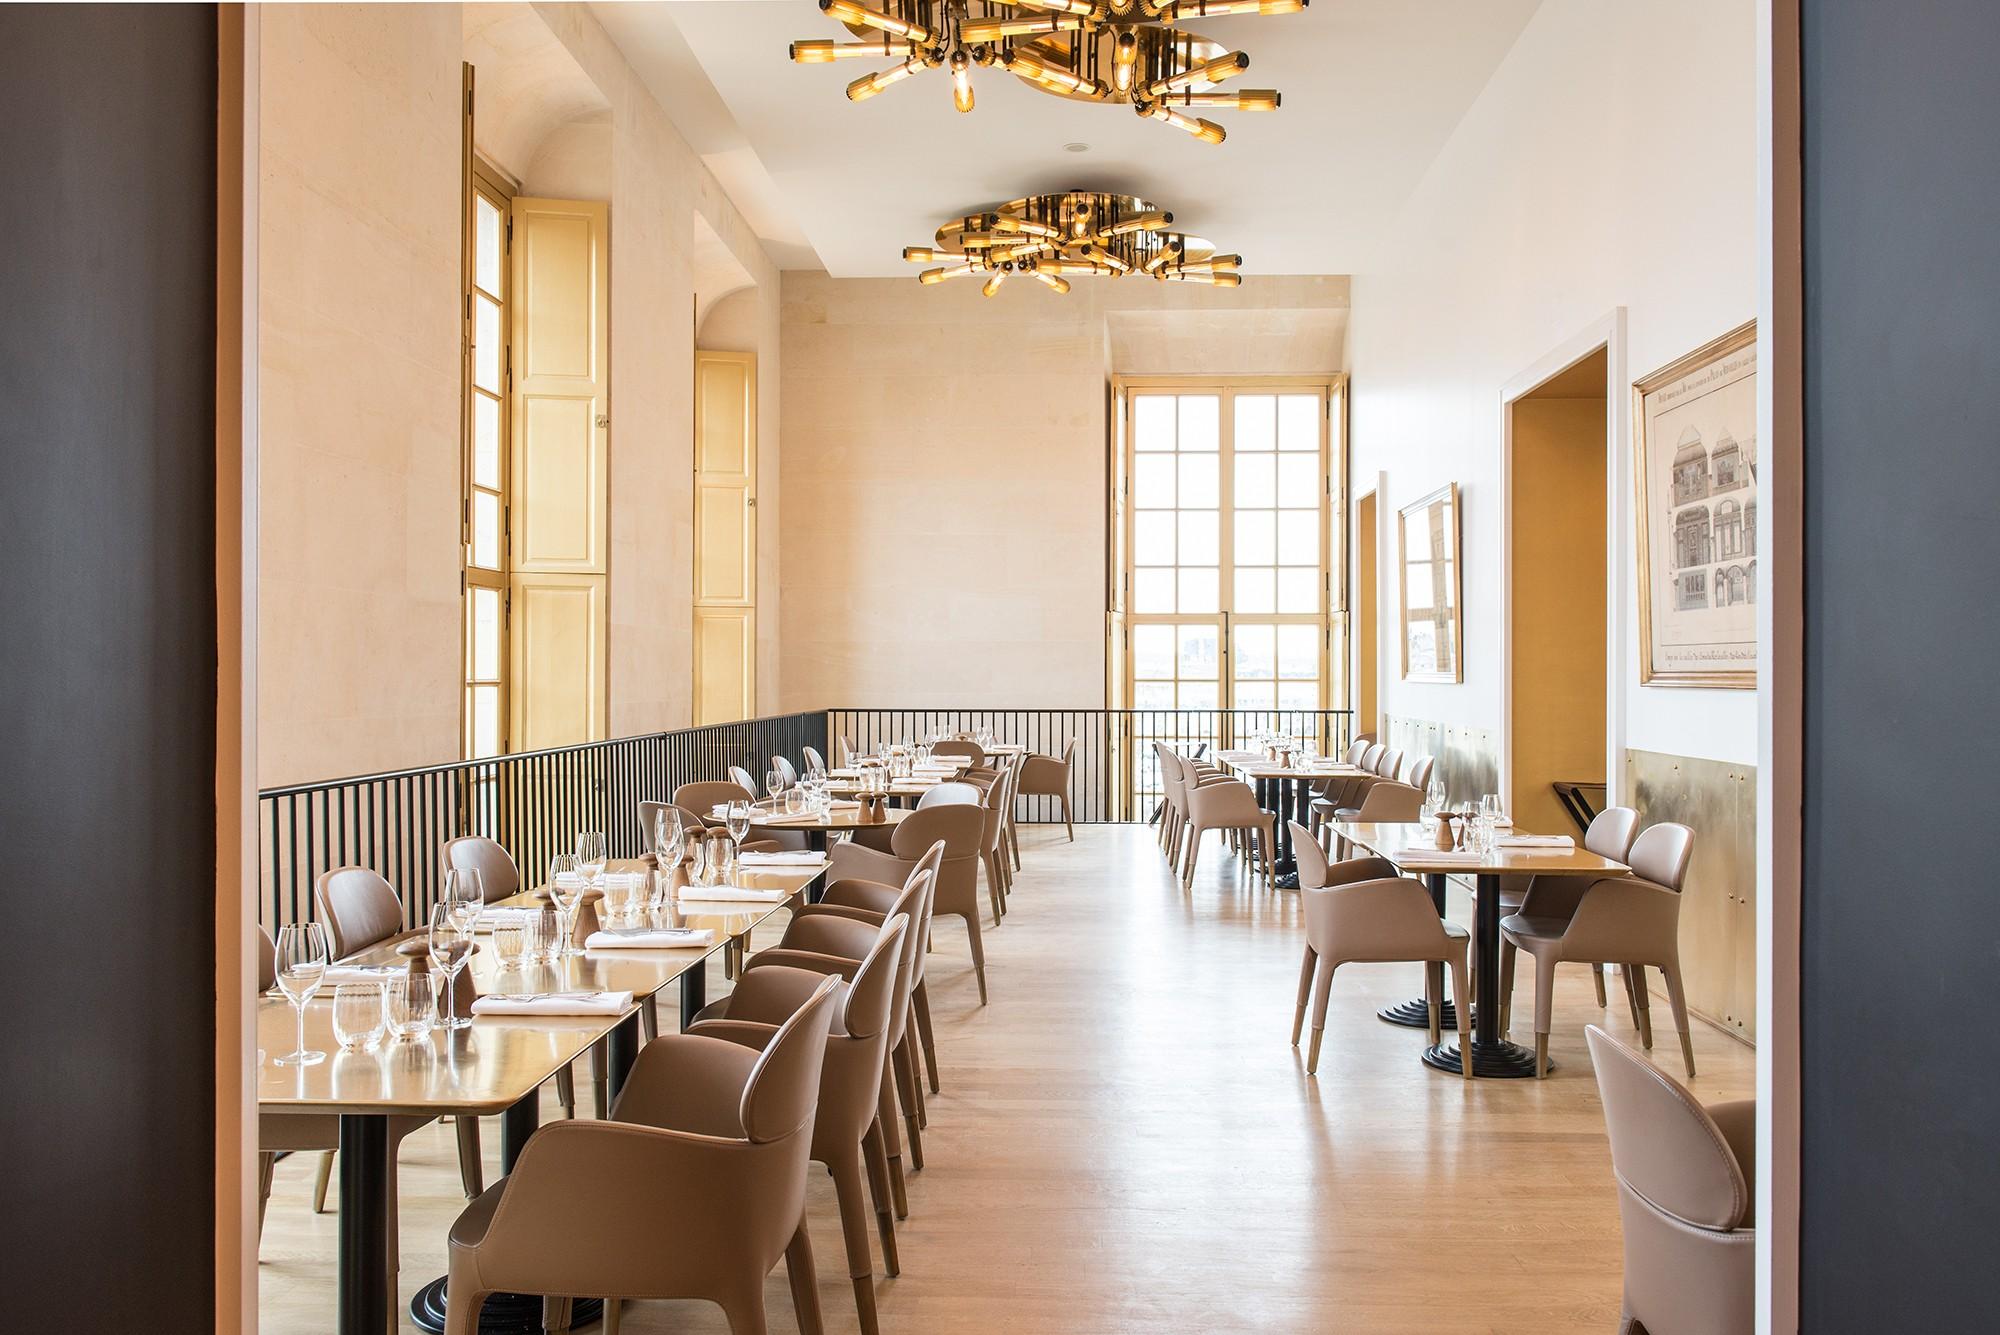 Ore Restaurant by Alain Ducasse